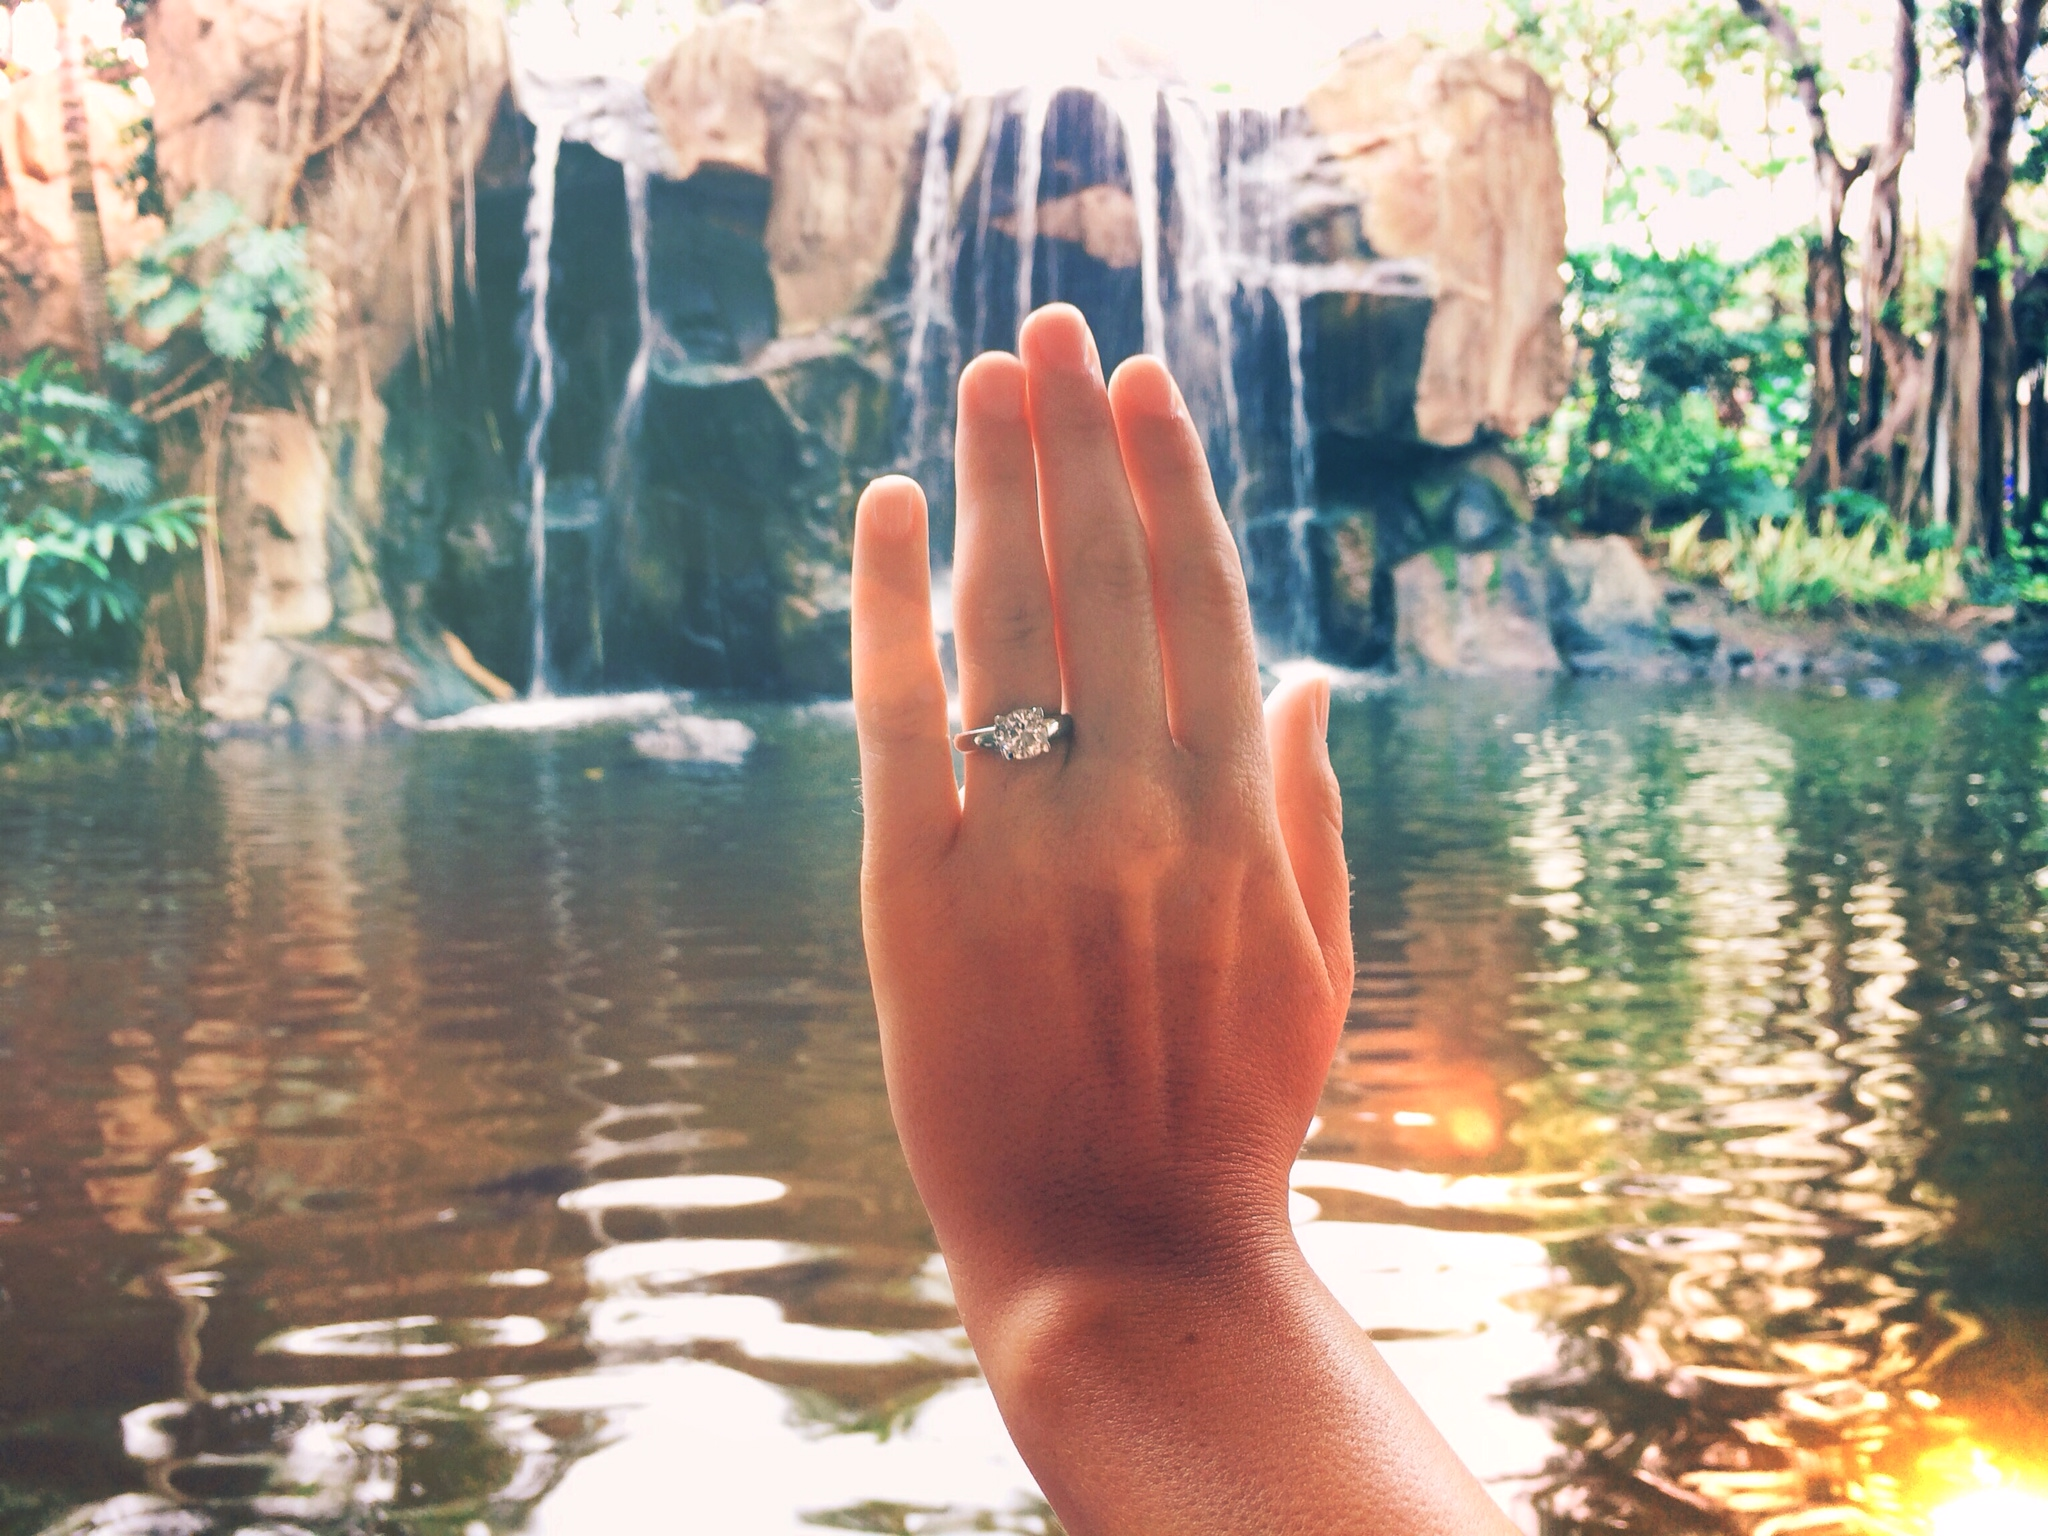 proposal in hawaii_ marriage proposal photo 1 (1)